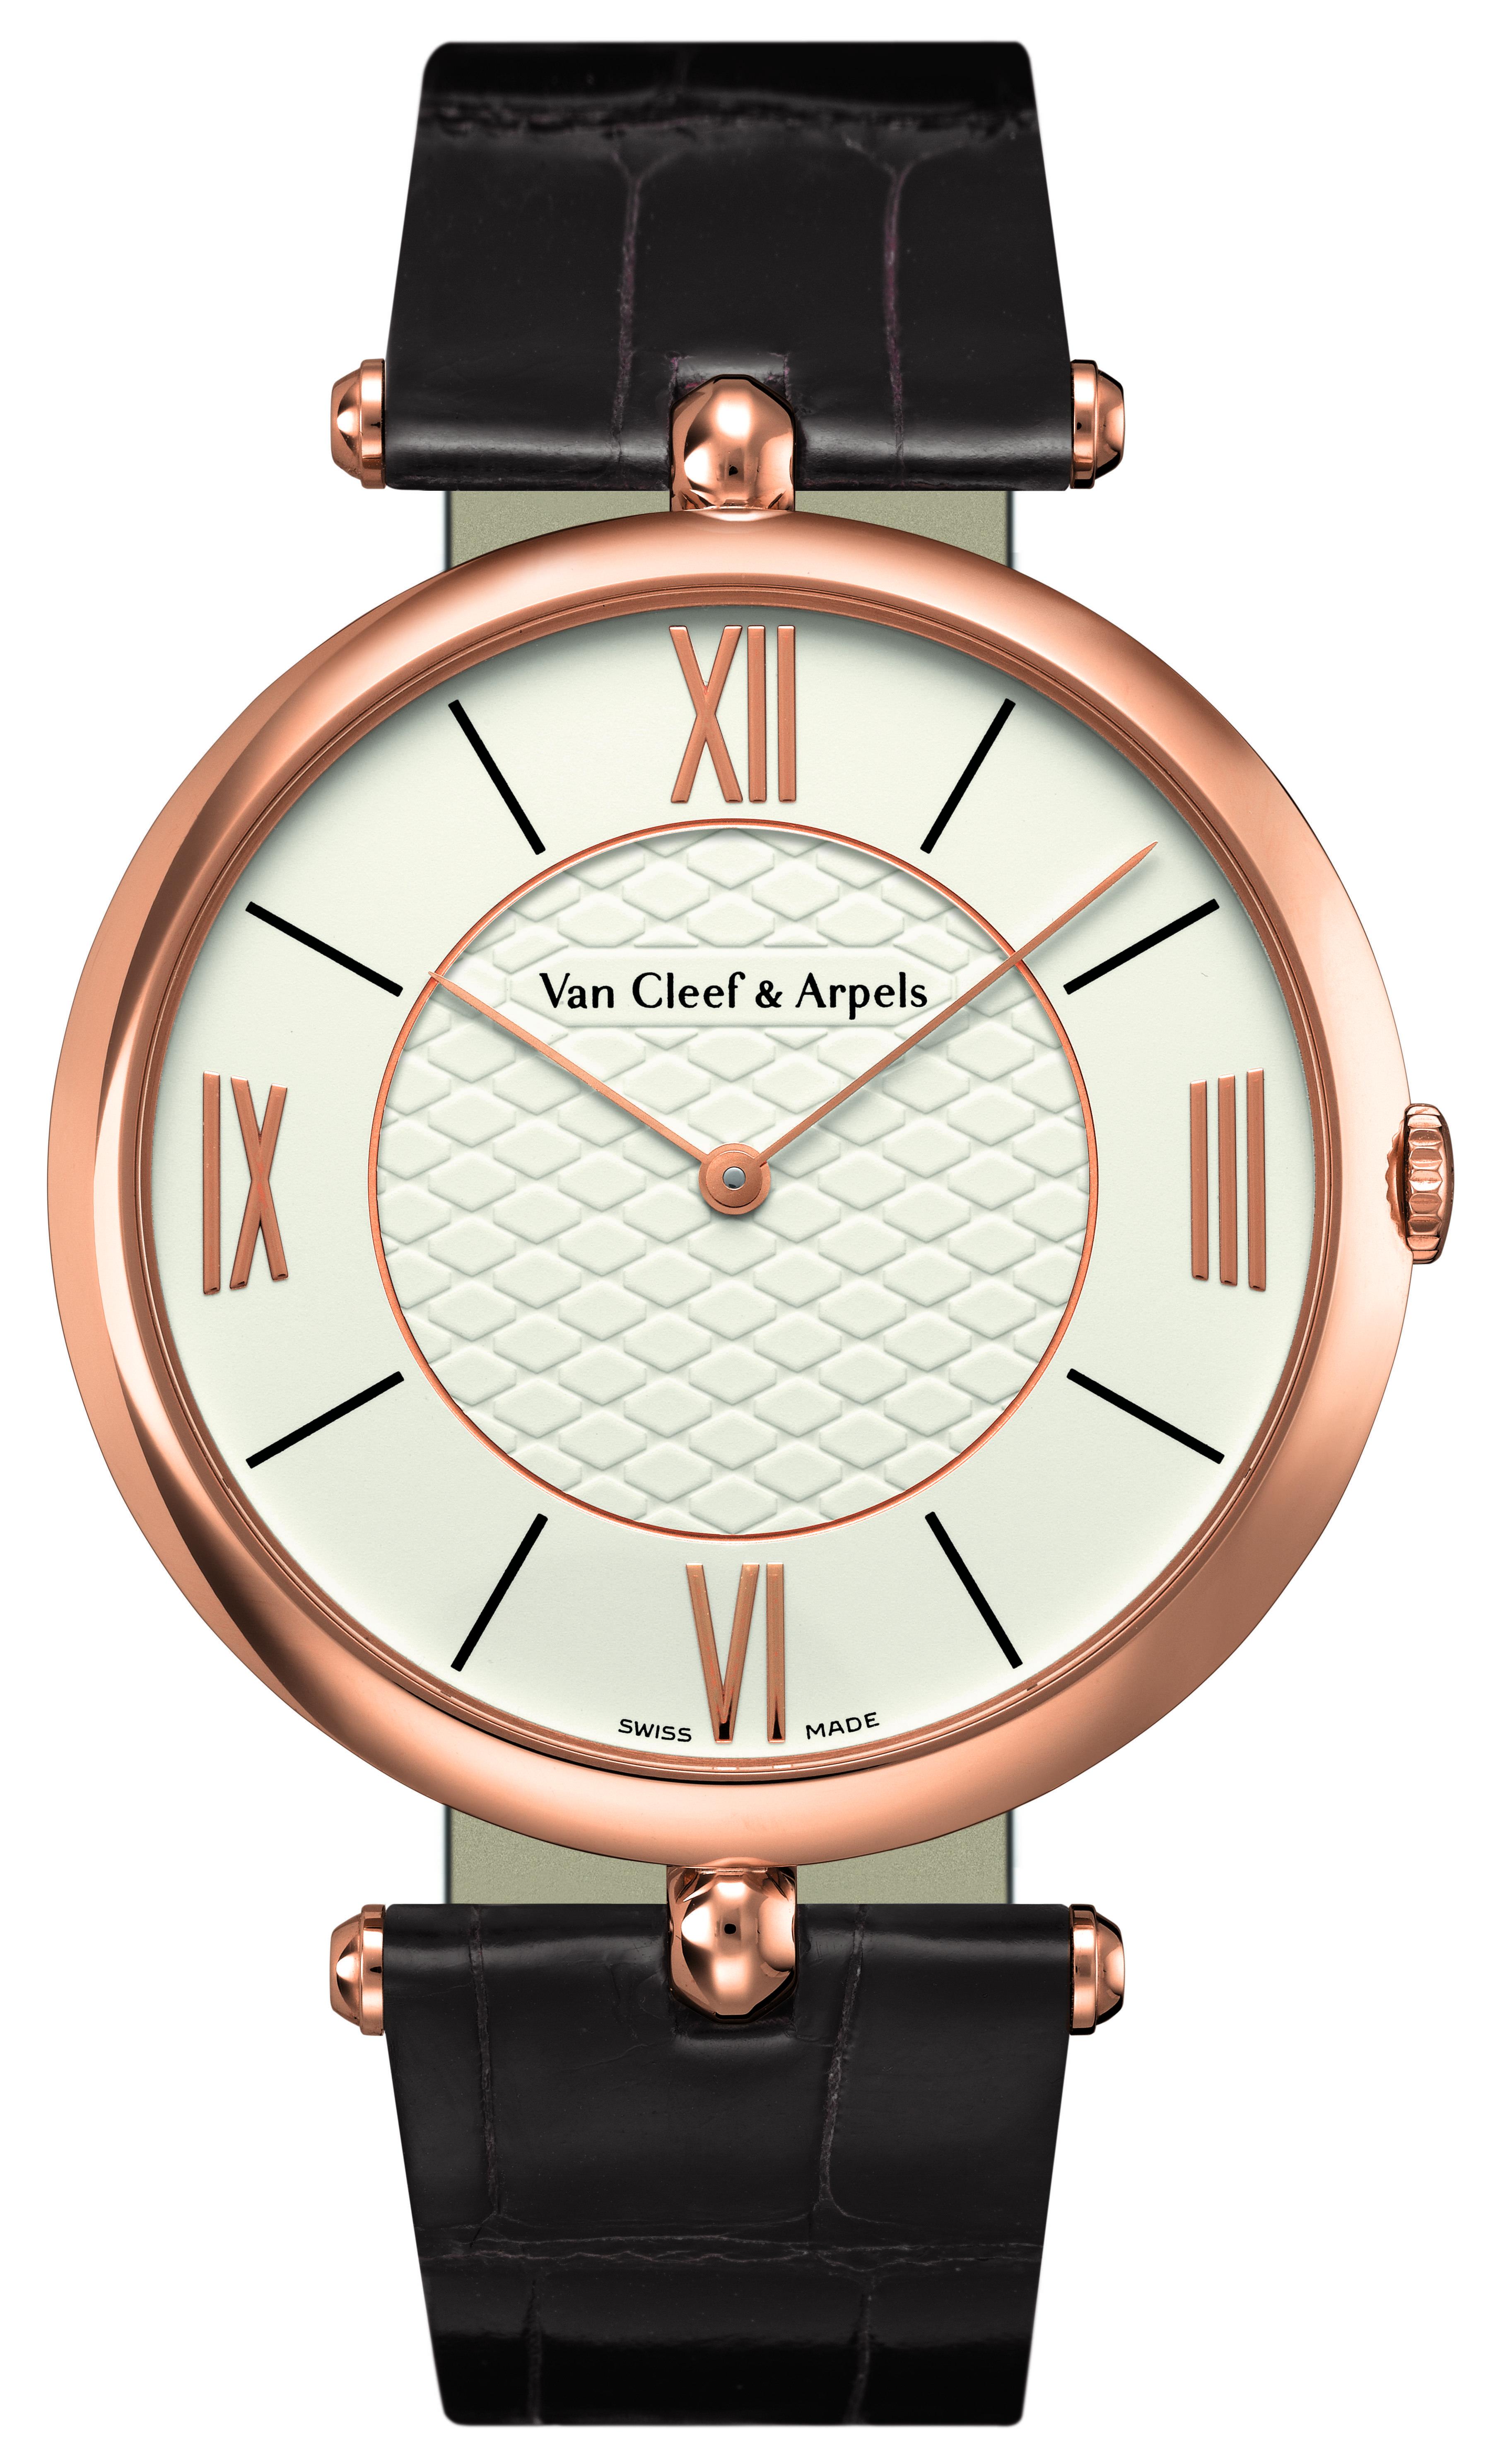 Throwback Thursday: Van Cleef & Arpels Pierre Arpels